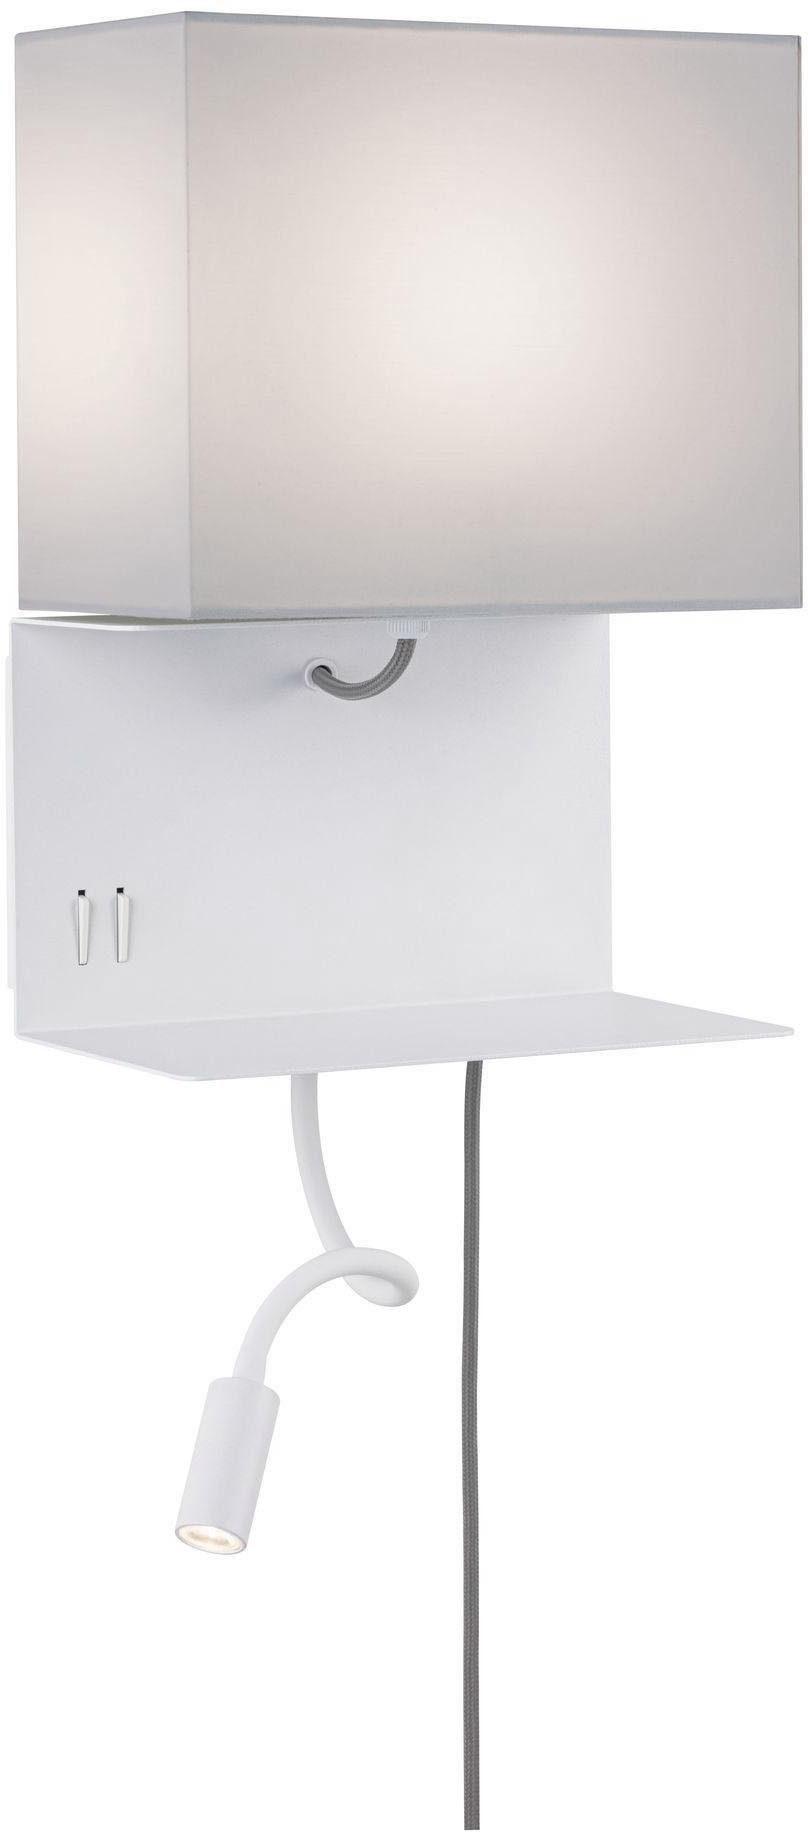 Paulmann LED Wandleuchte Merani Grau/Weiß max 1x40W/3W E27 Stoff/Metall, E27, Warmweiß